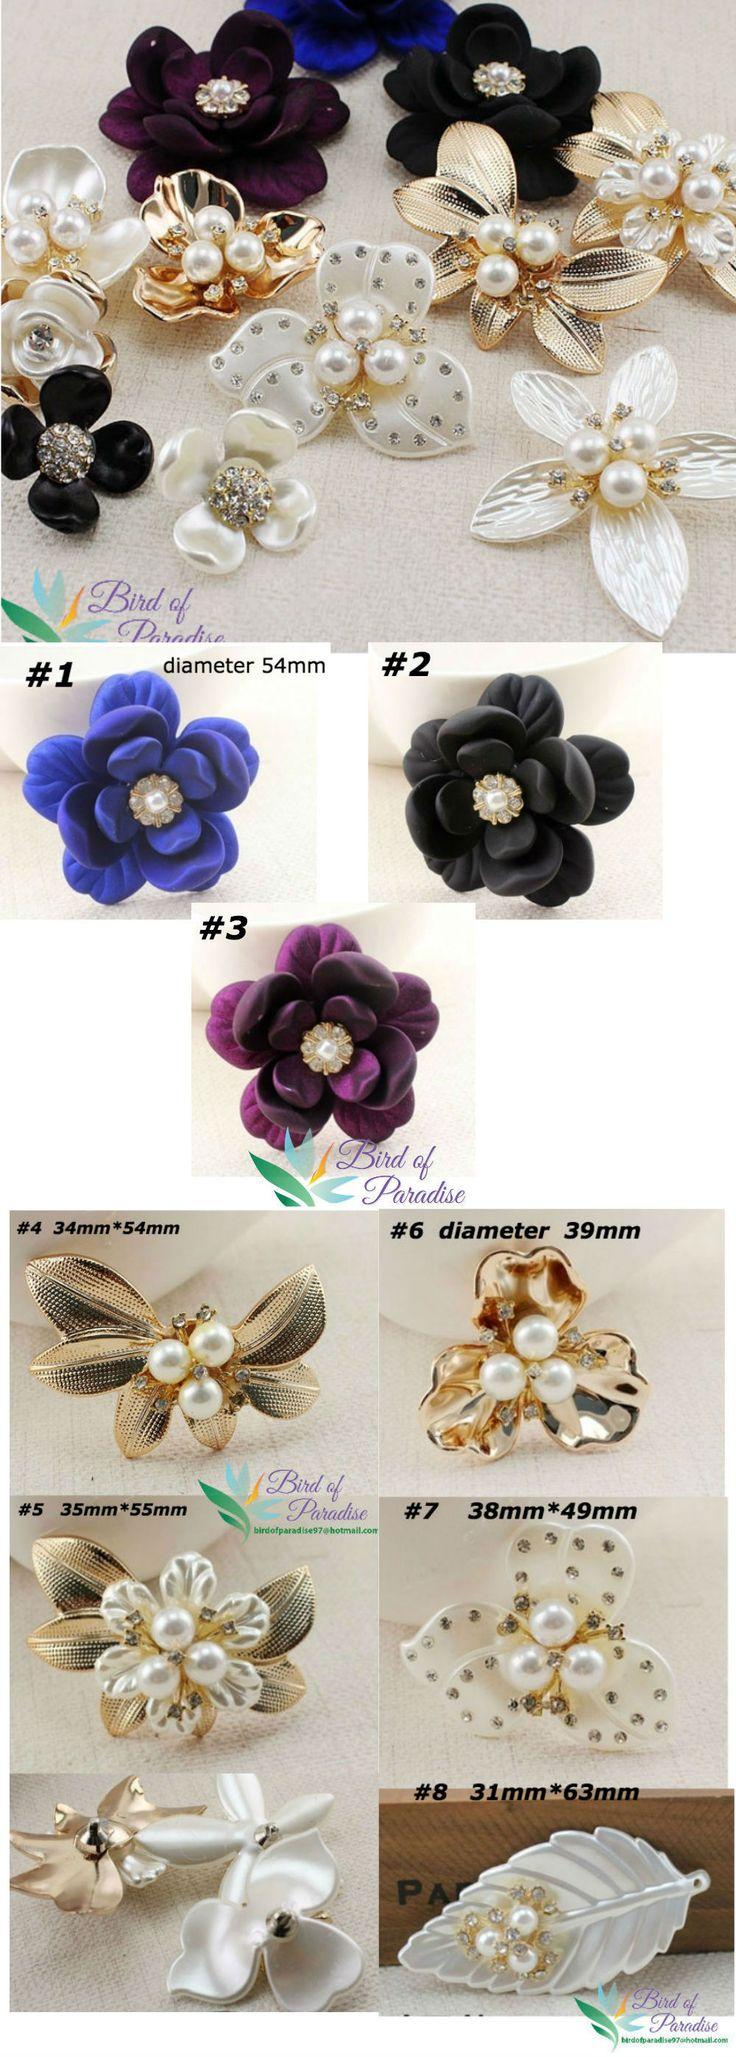 Diy hair accessories for weddings -  Charm Wedding Accessories Diy Charms Charms Flower Buy Charms Charm